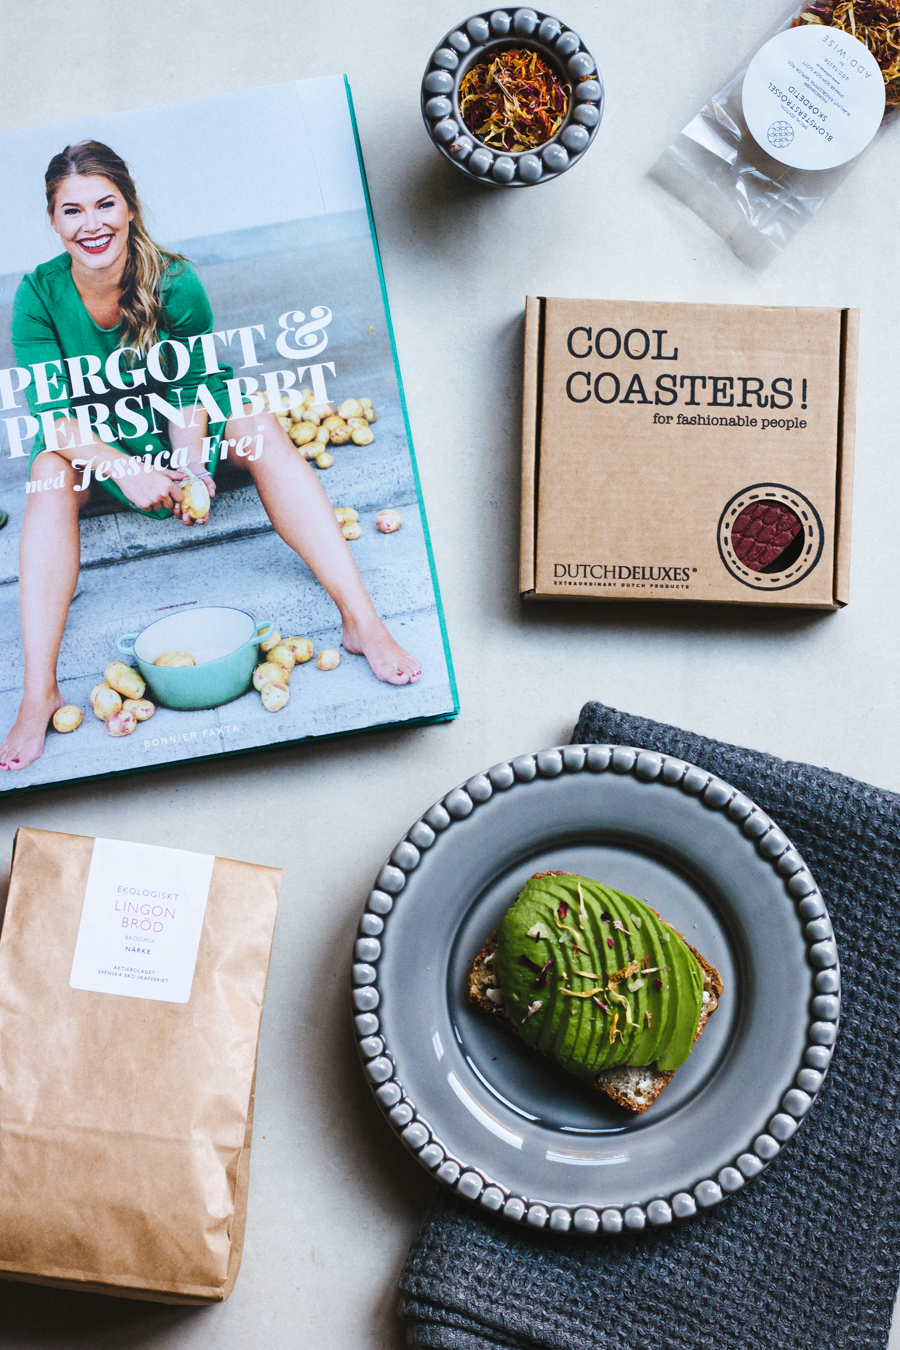 Bloggfrukost & inspirerande talk med Jessica Frej